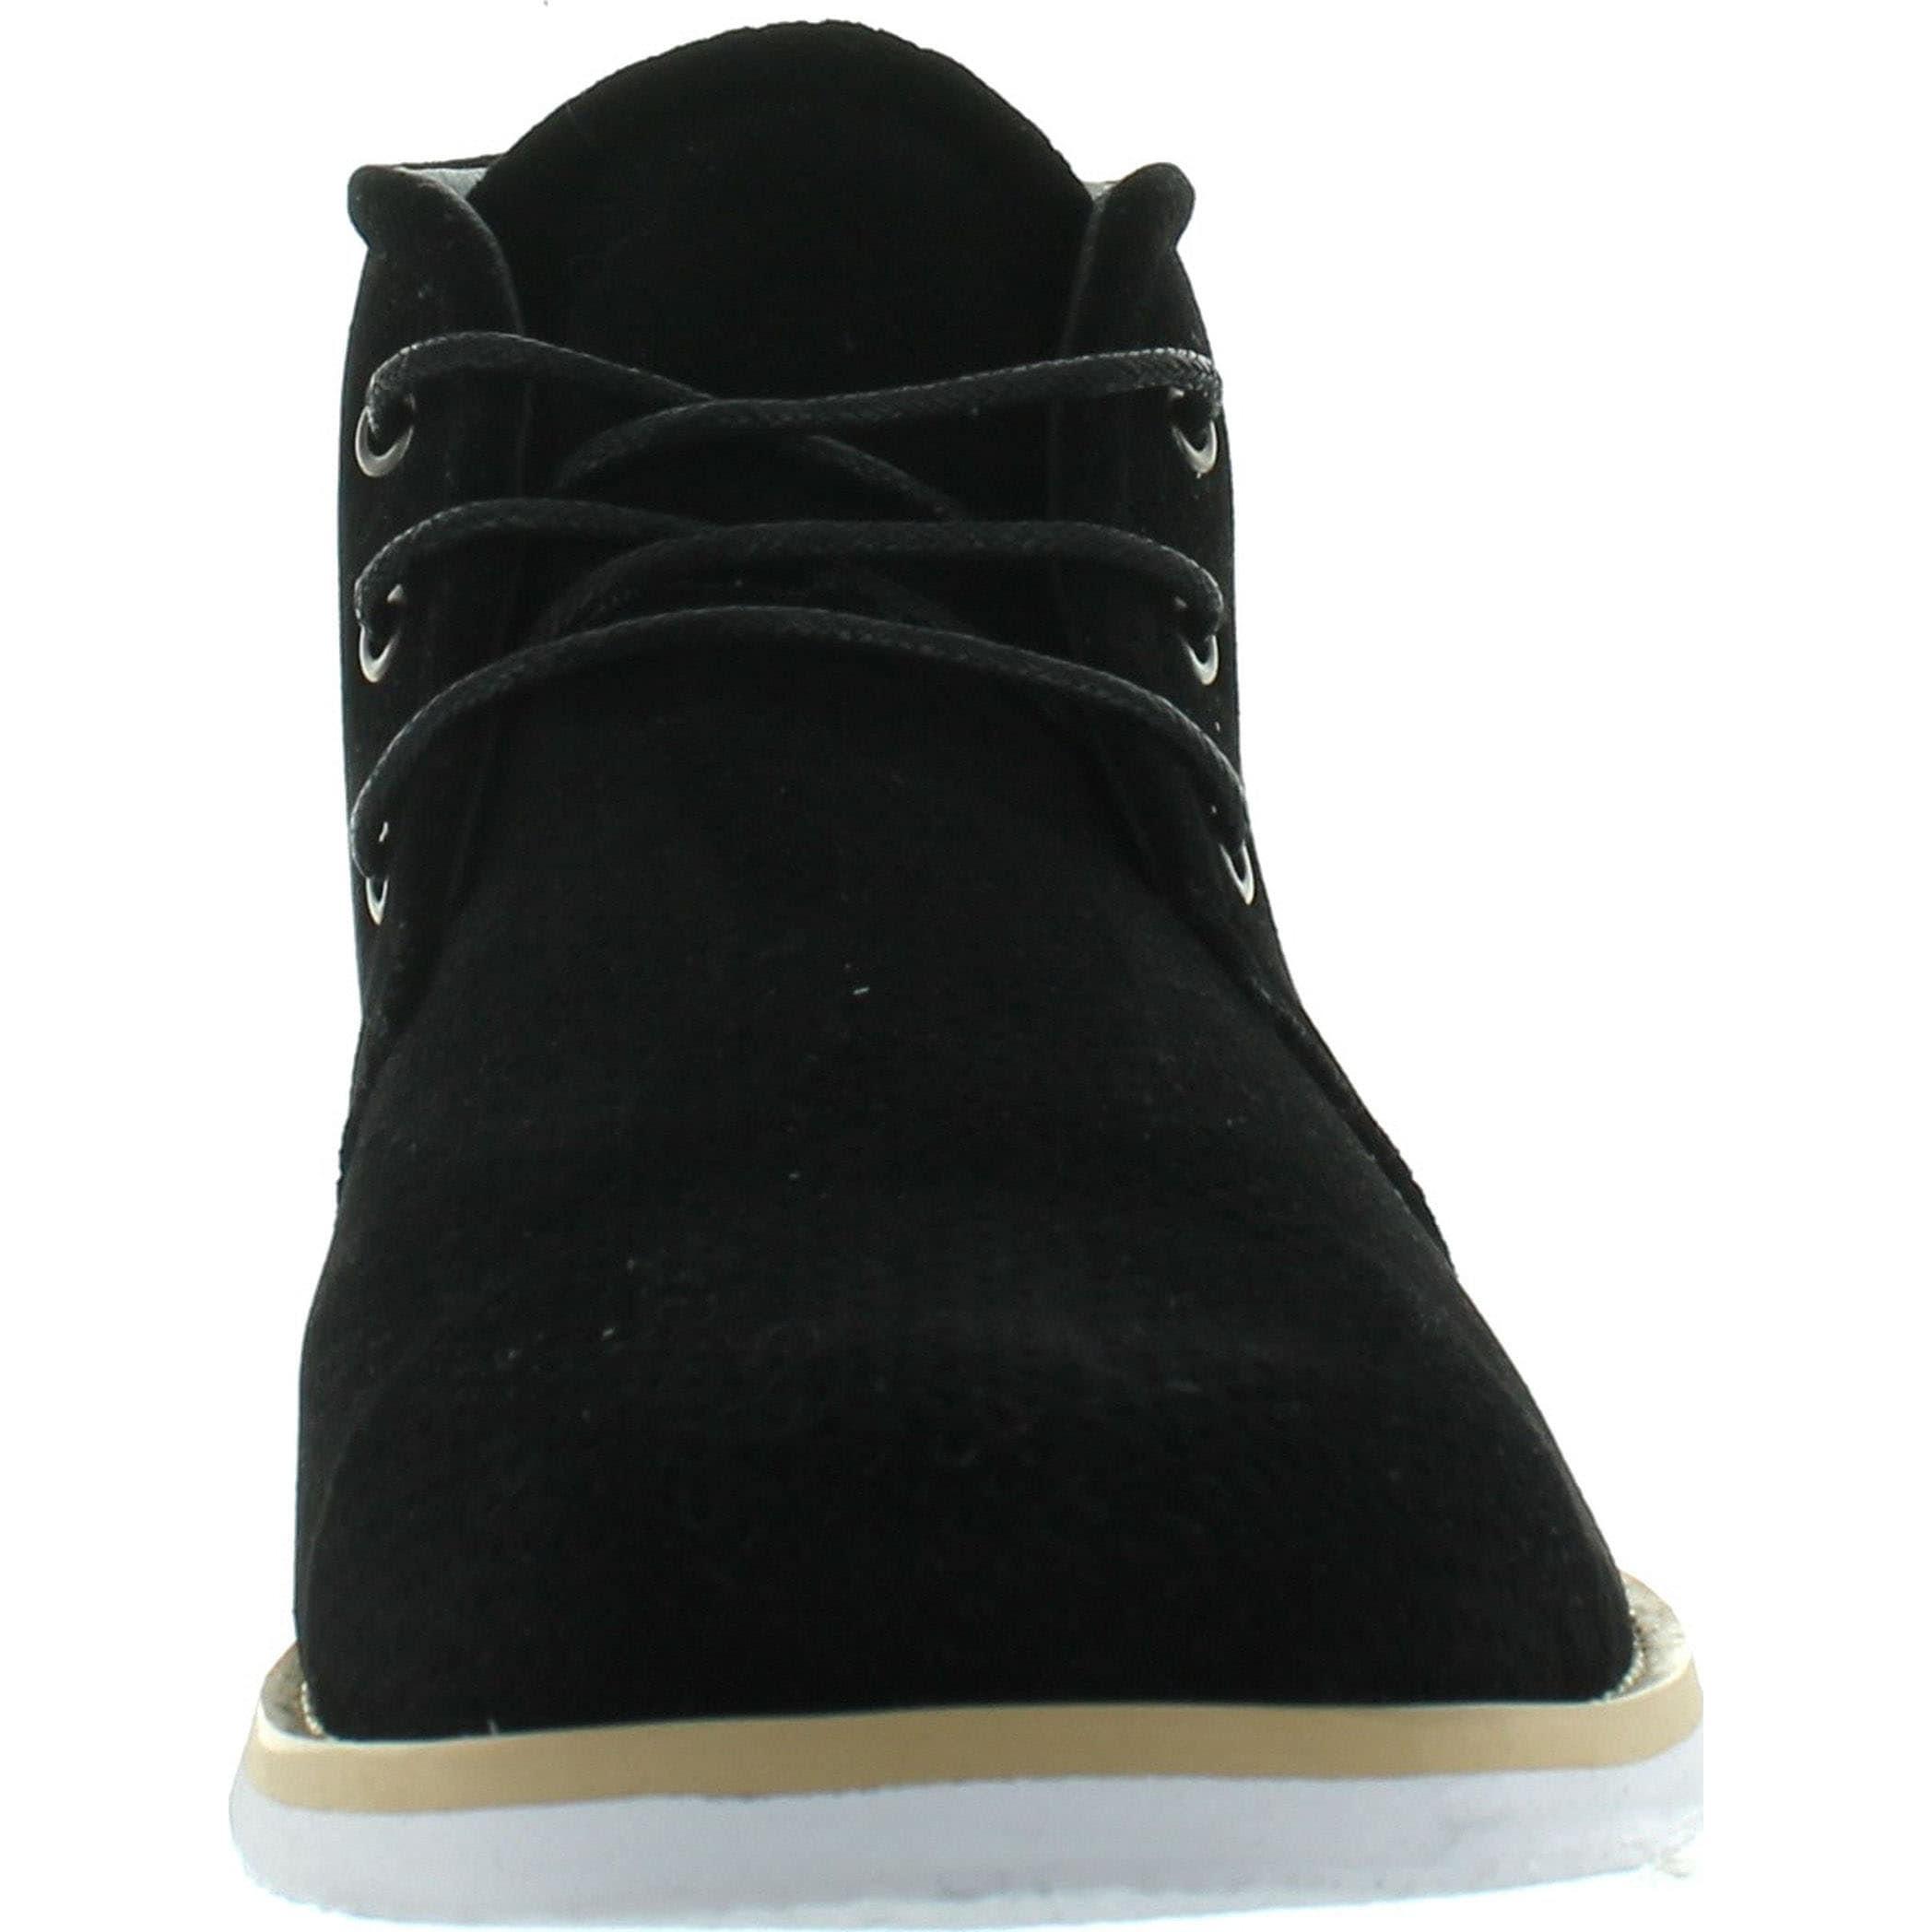 e0600b8a4d6 Franco Vanucci Men's Faux-Suede Leather Chukka Boot